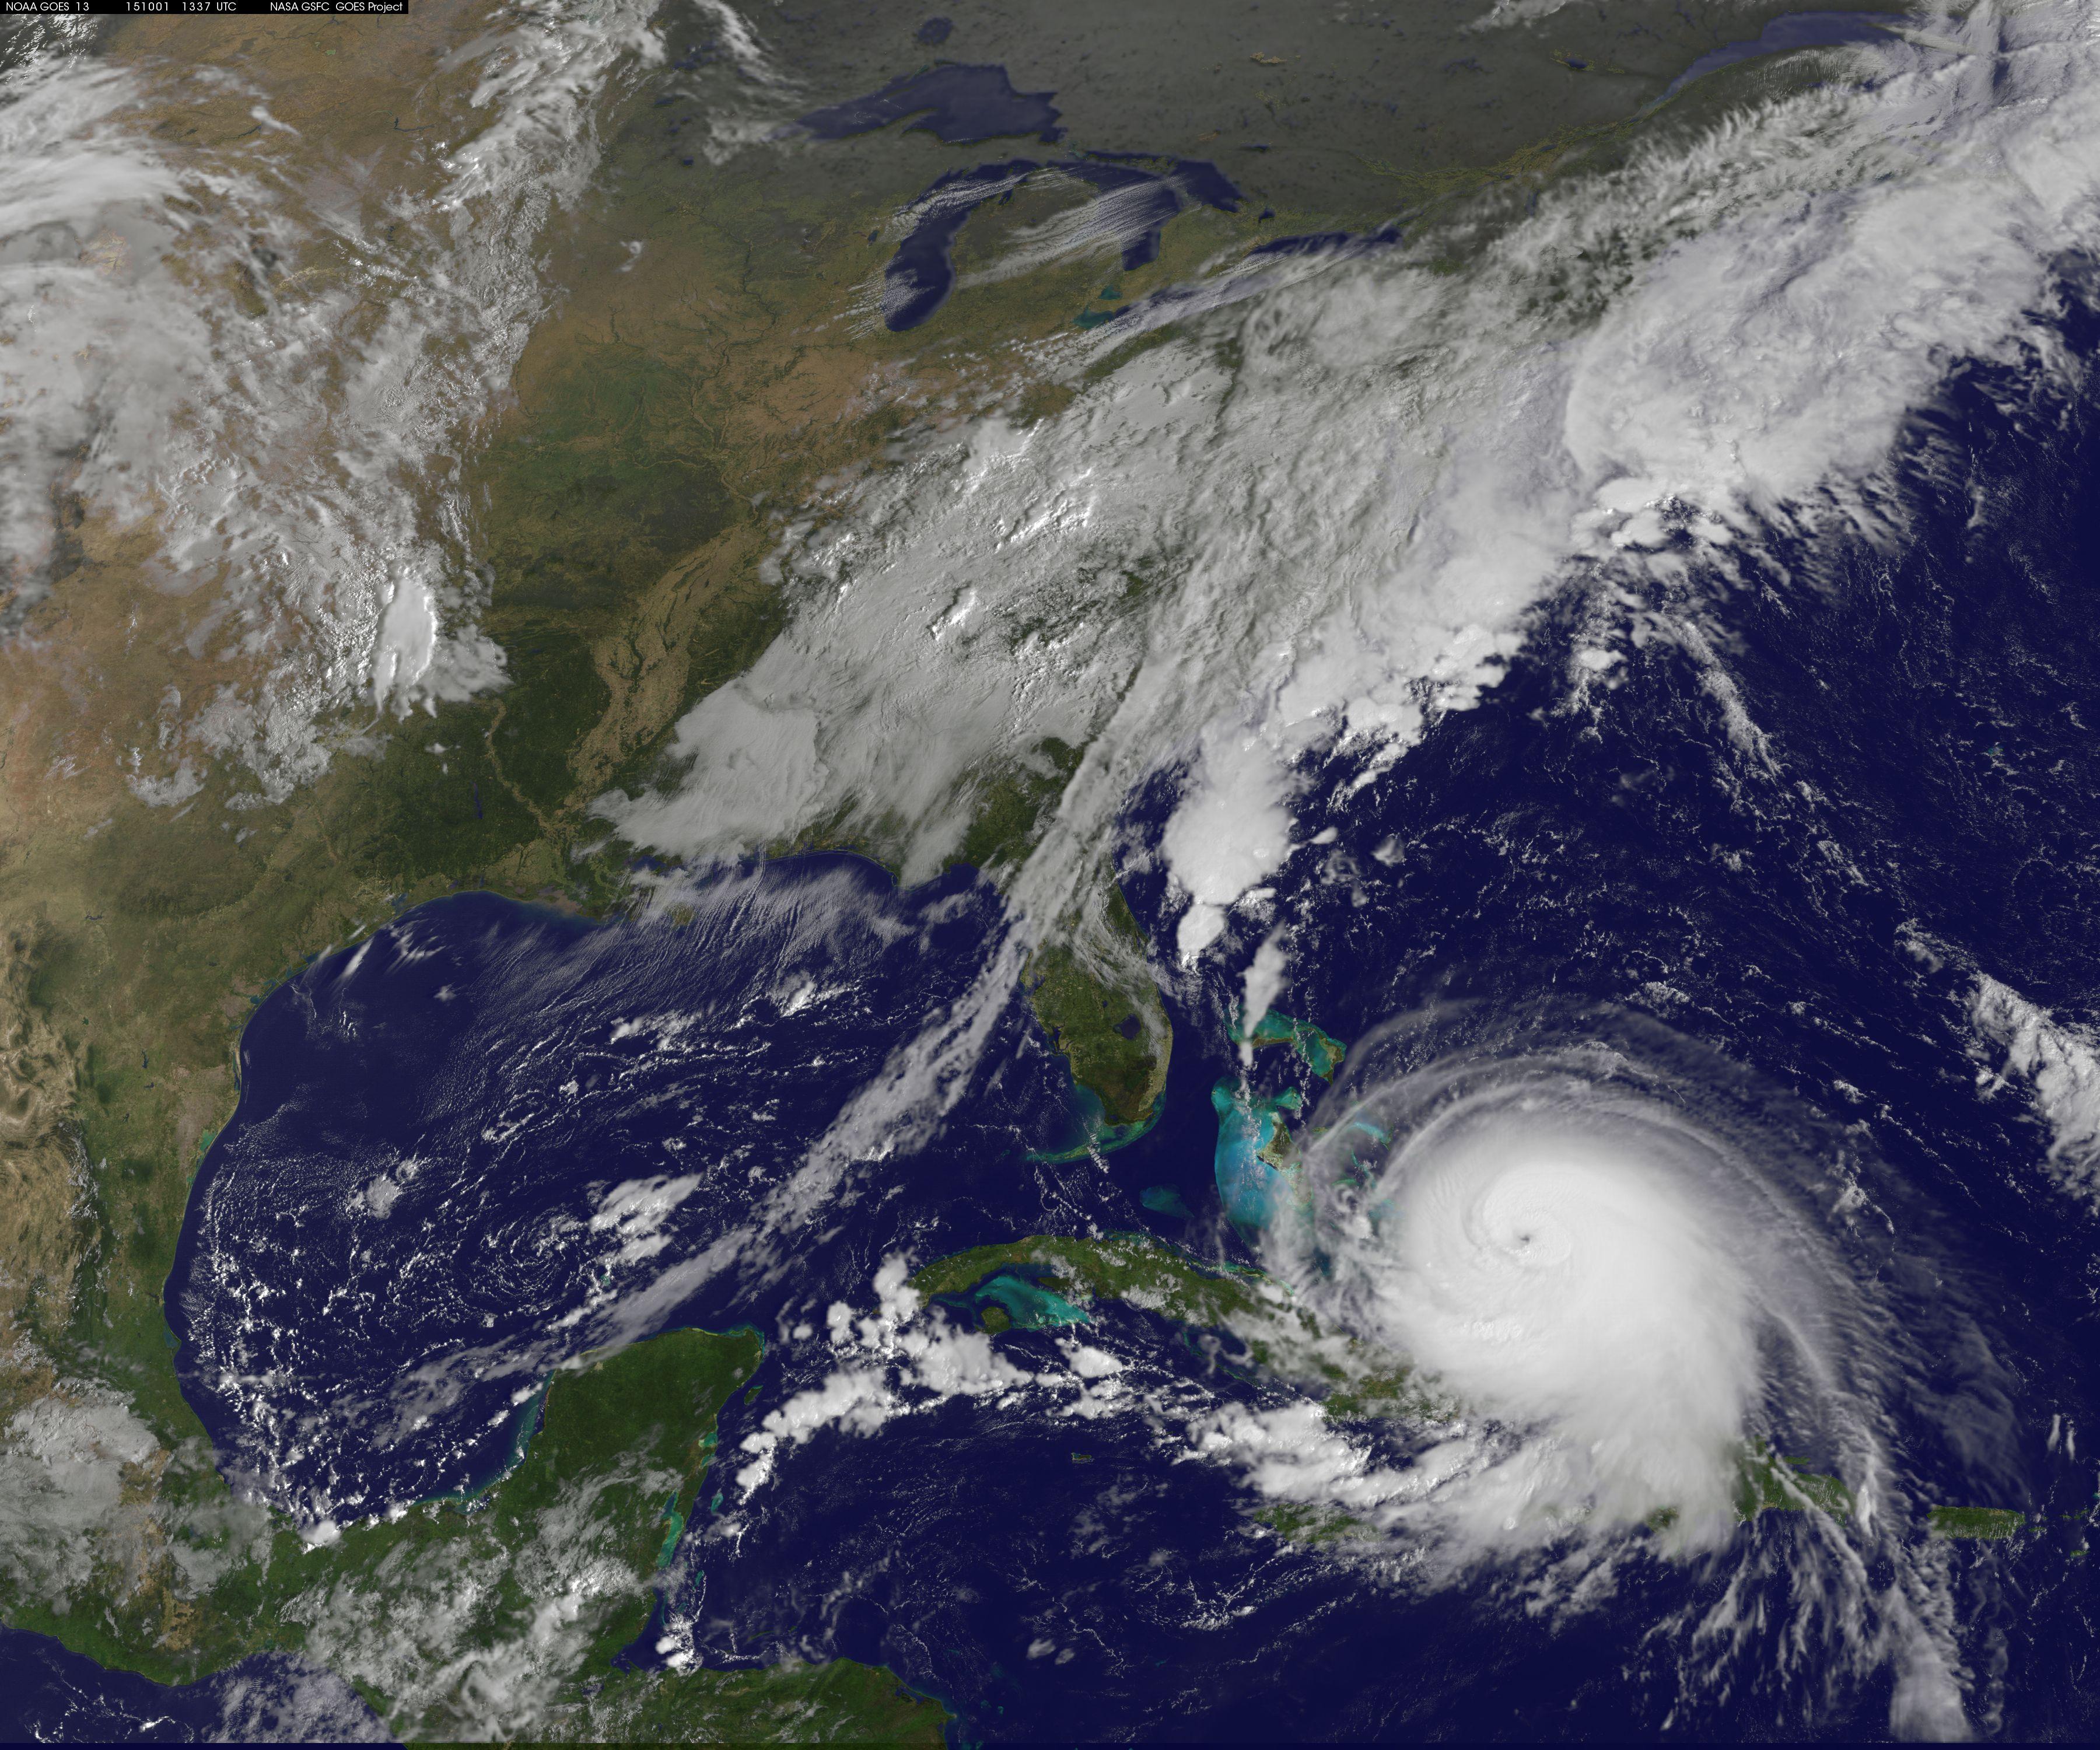 FileLatest View Of Hurricane Joaquin Jpg - Latest satellite view